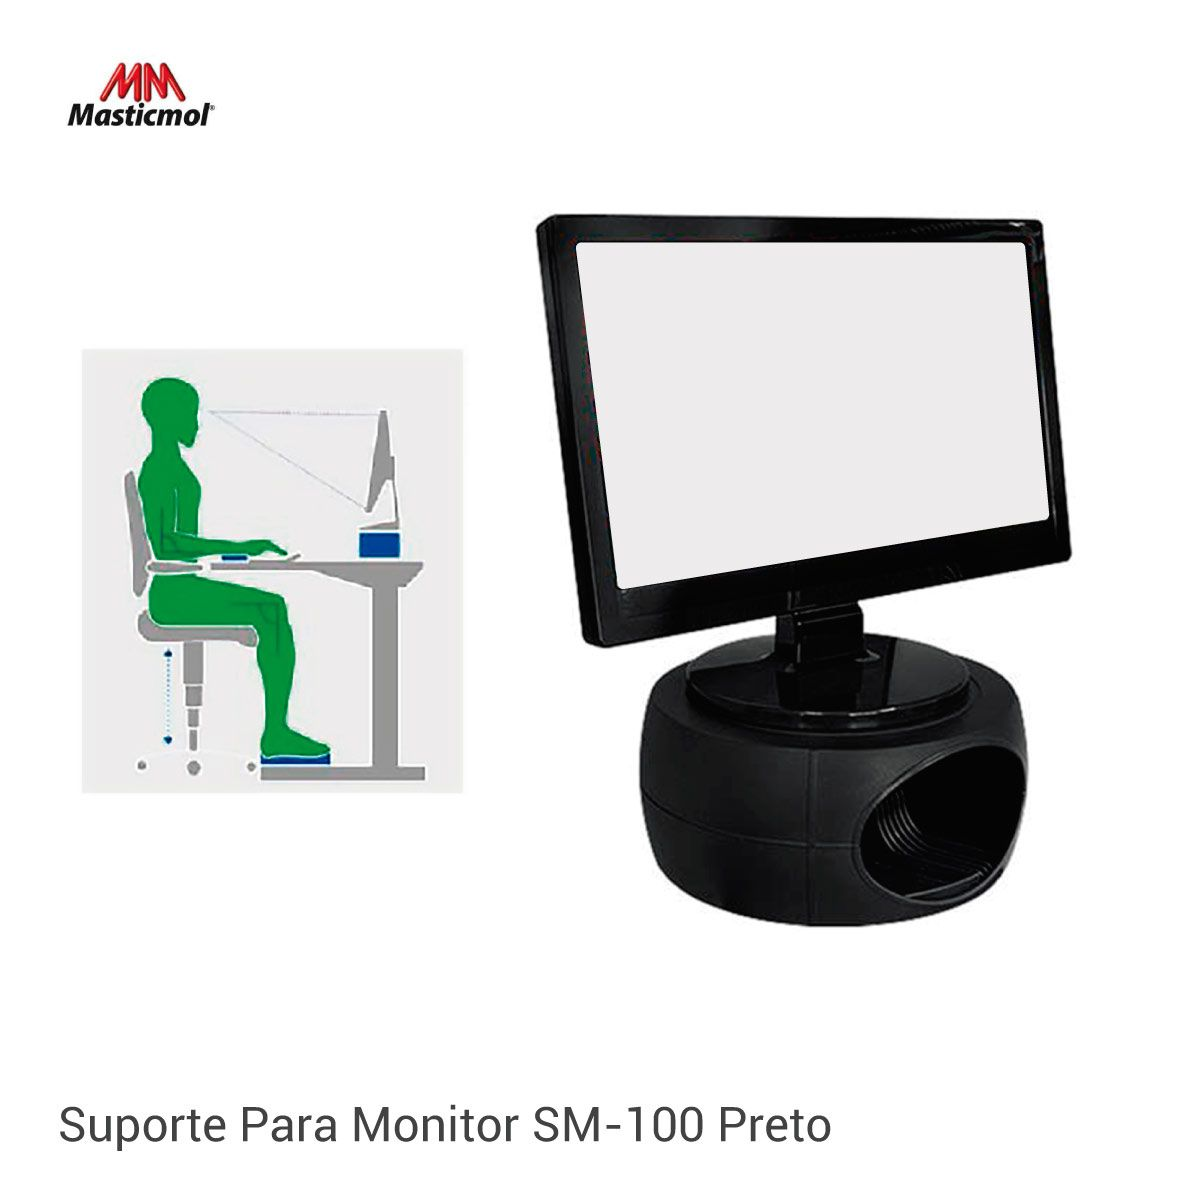 Suporte Para Monitor Sm-100 Preto - Masticmol